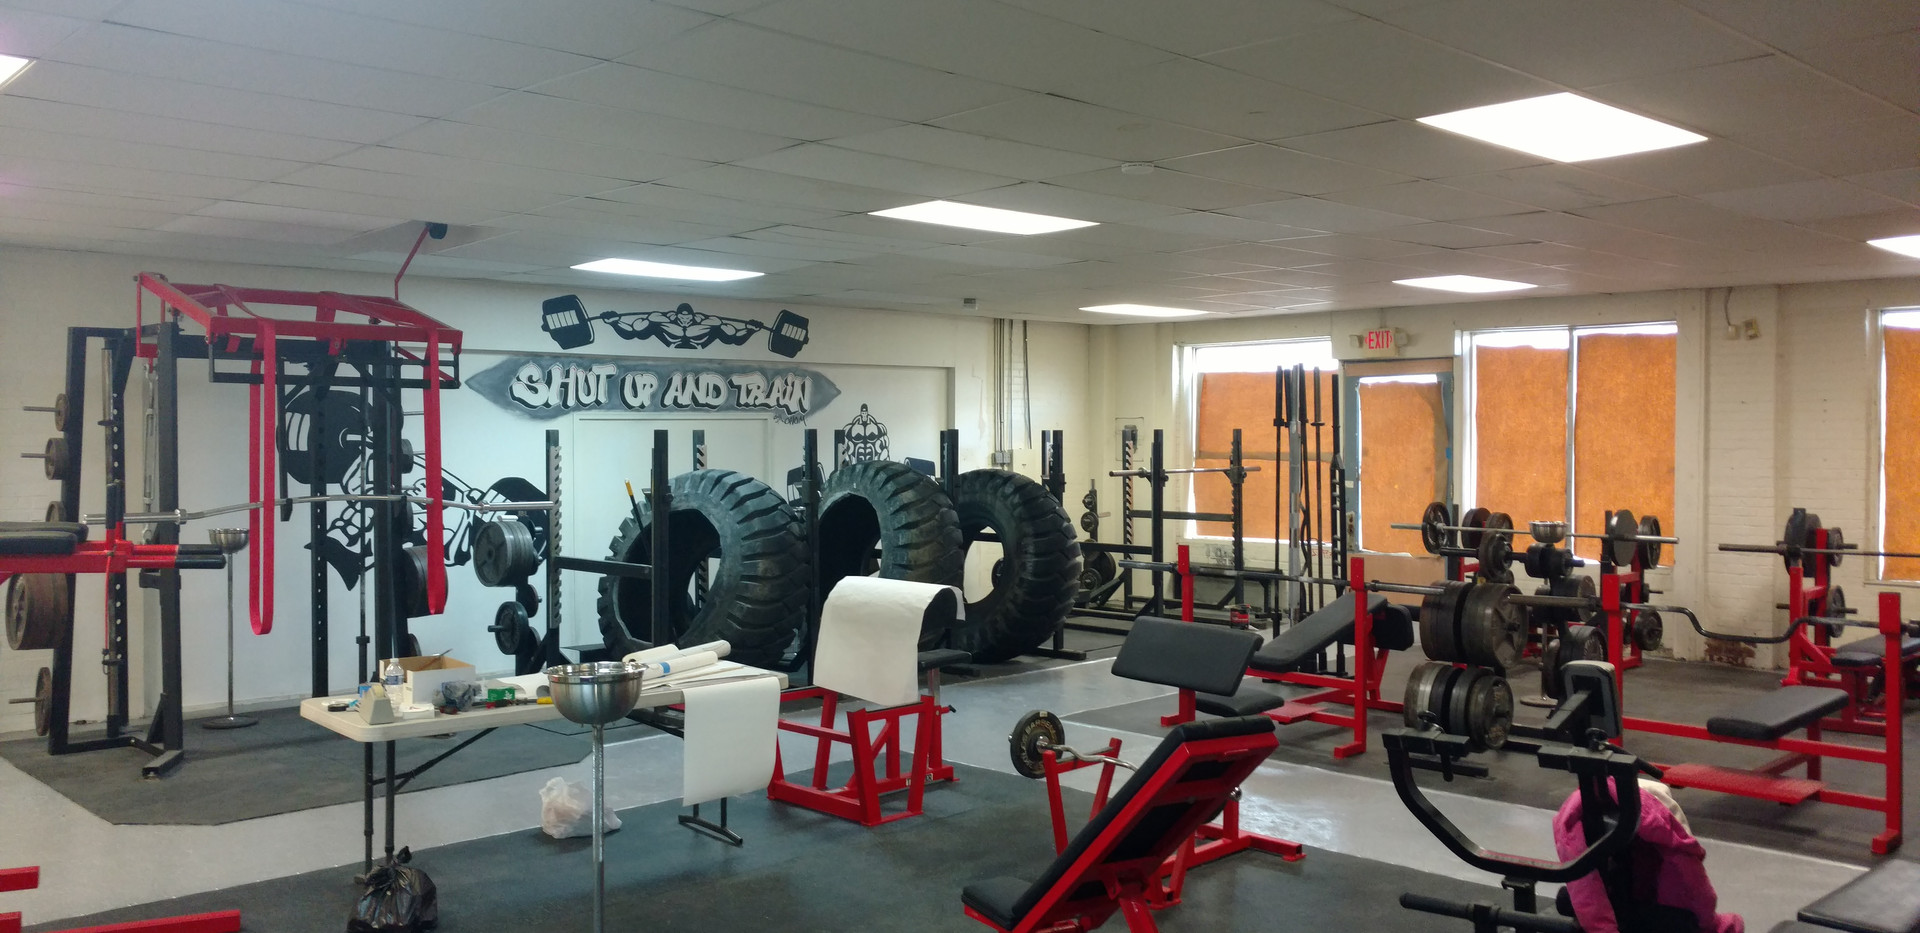 Half of the Gym